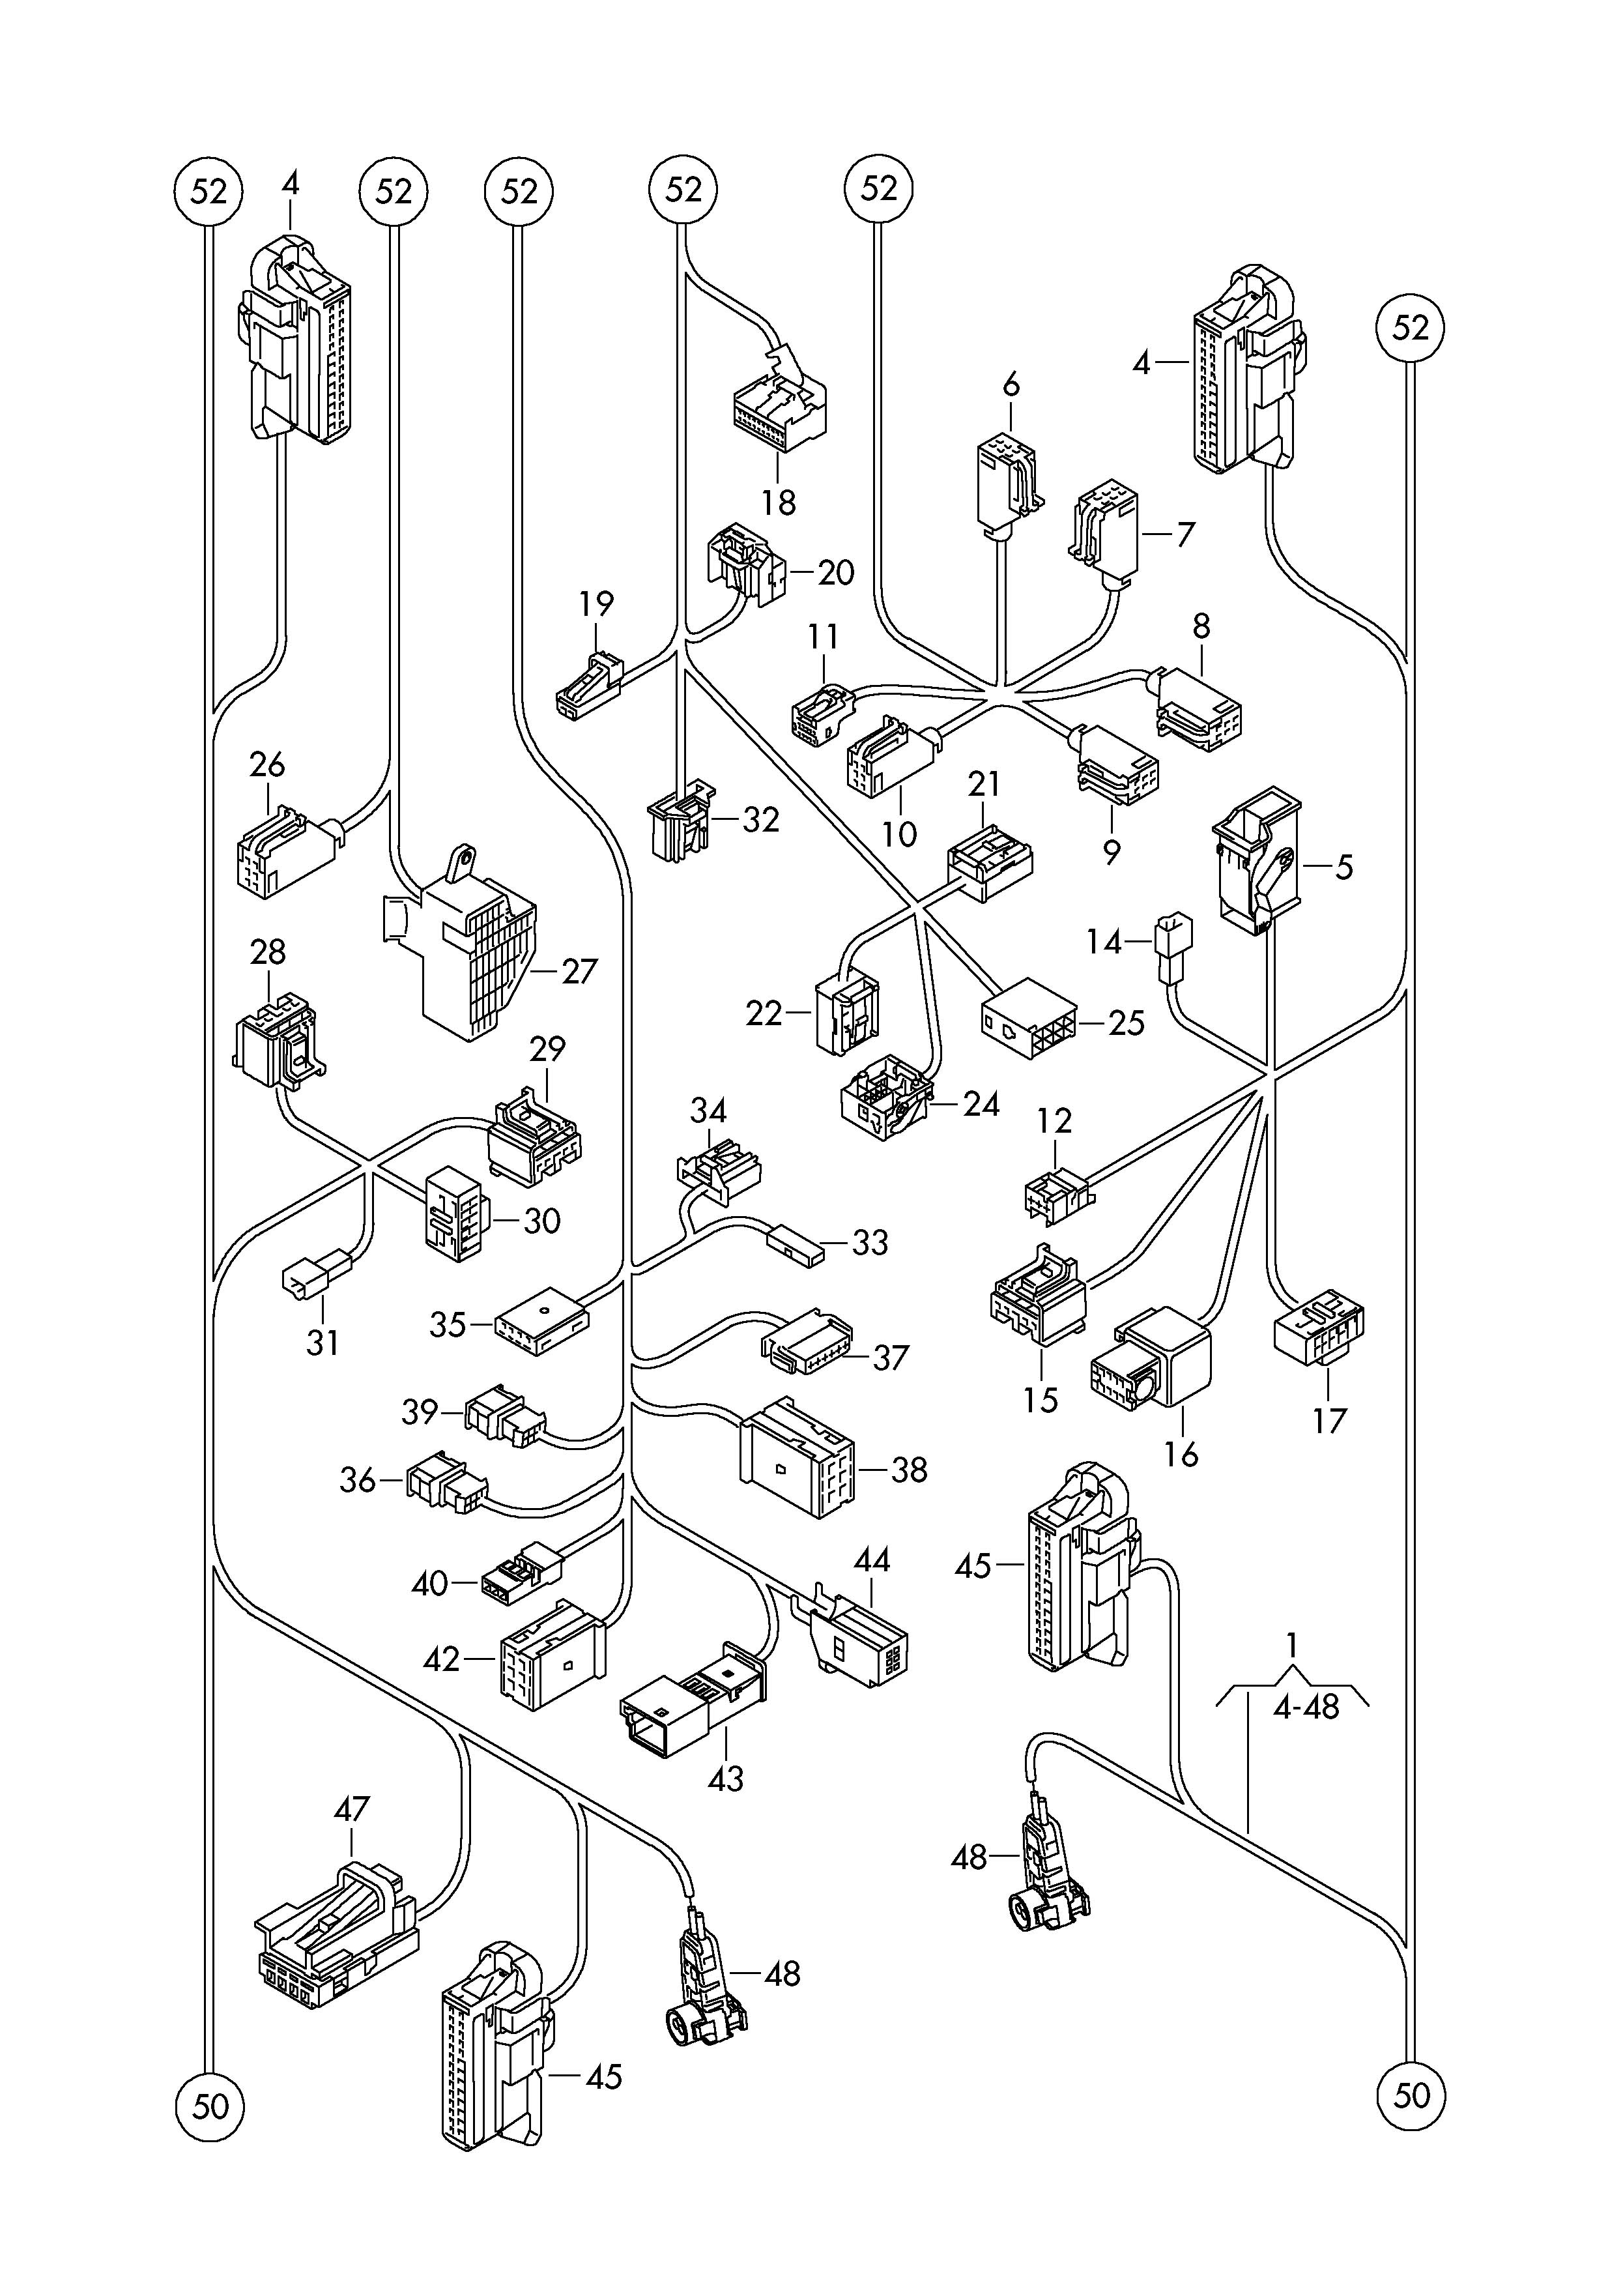 05 gto engine harness diagram